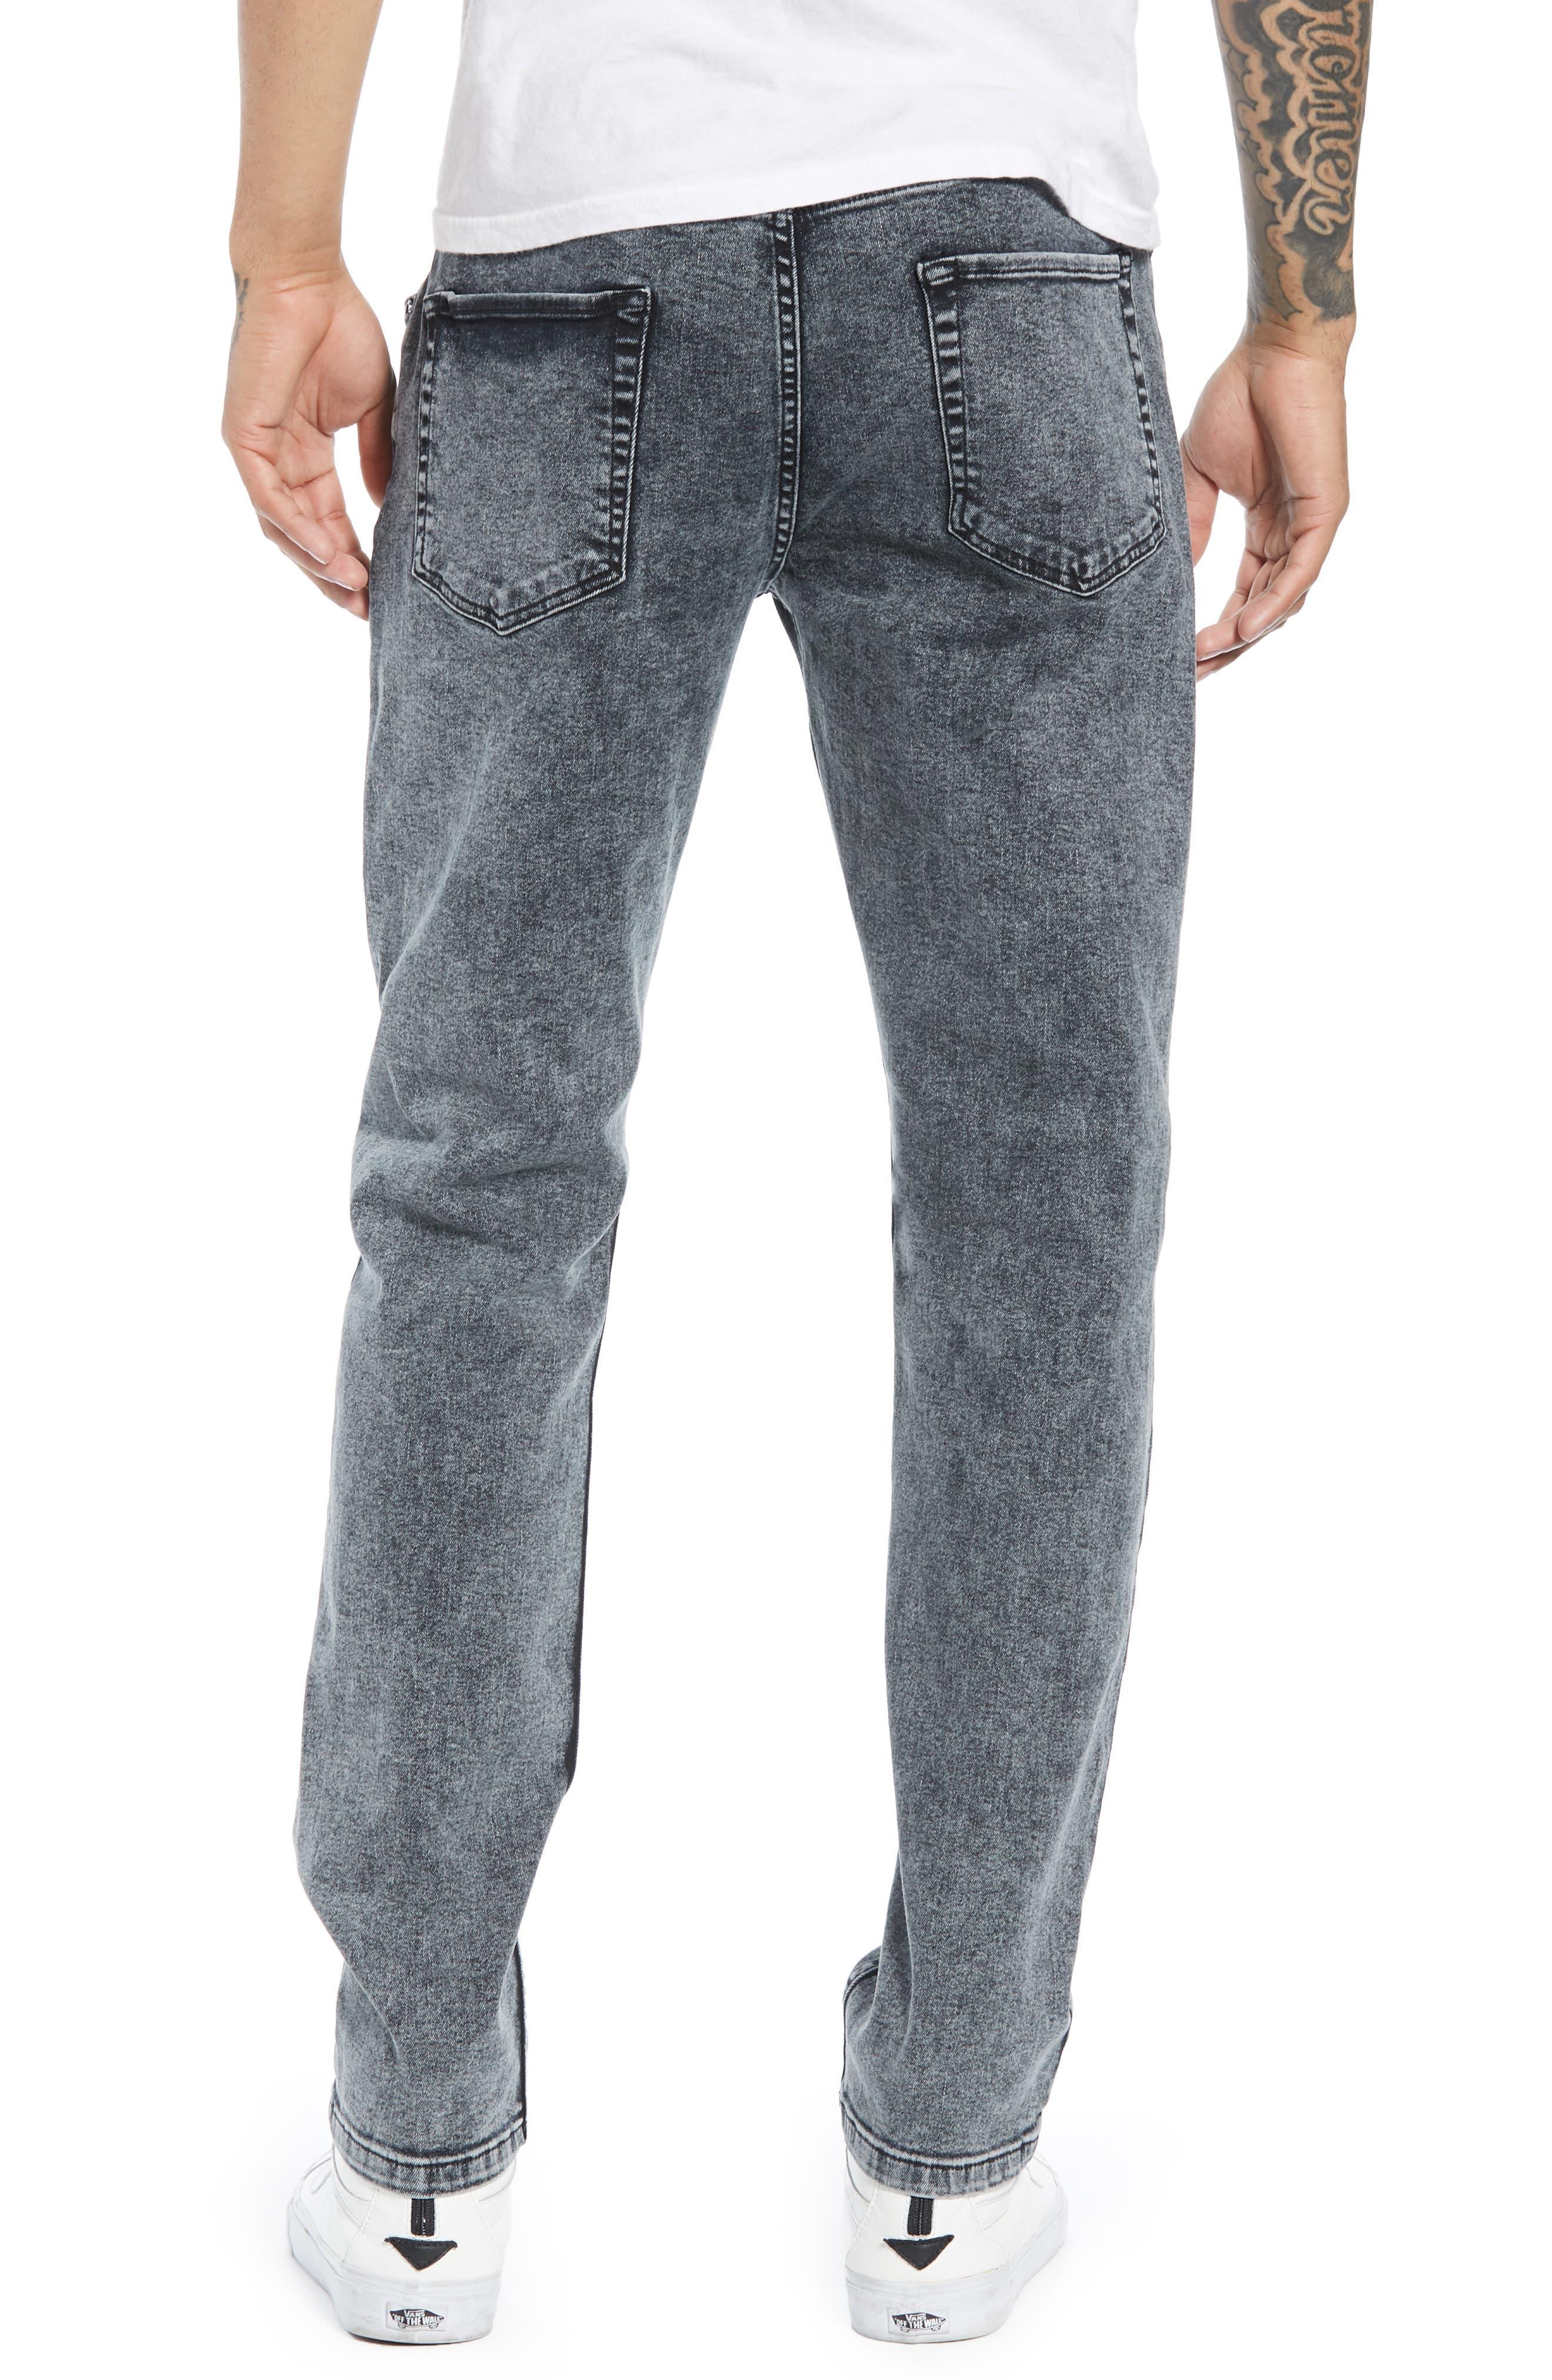 Acid Wash Stretch Skinny Jeans,                             Alternate thumbnail 2, color,                             GREY